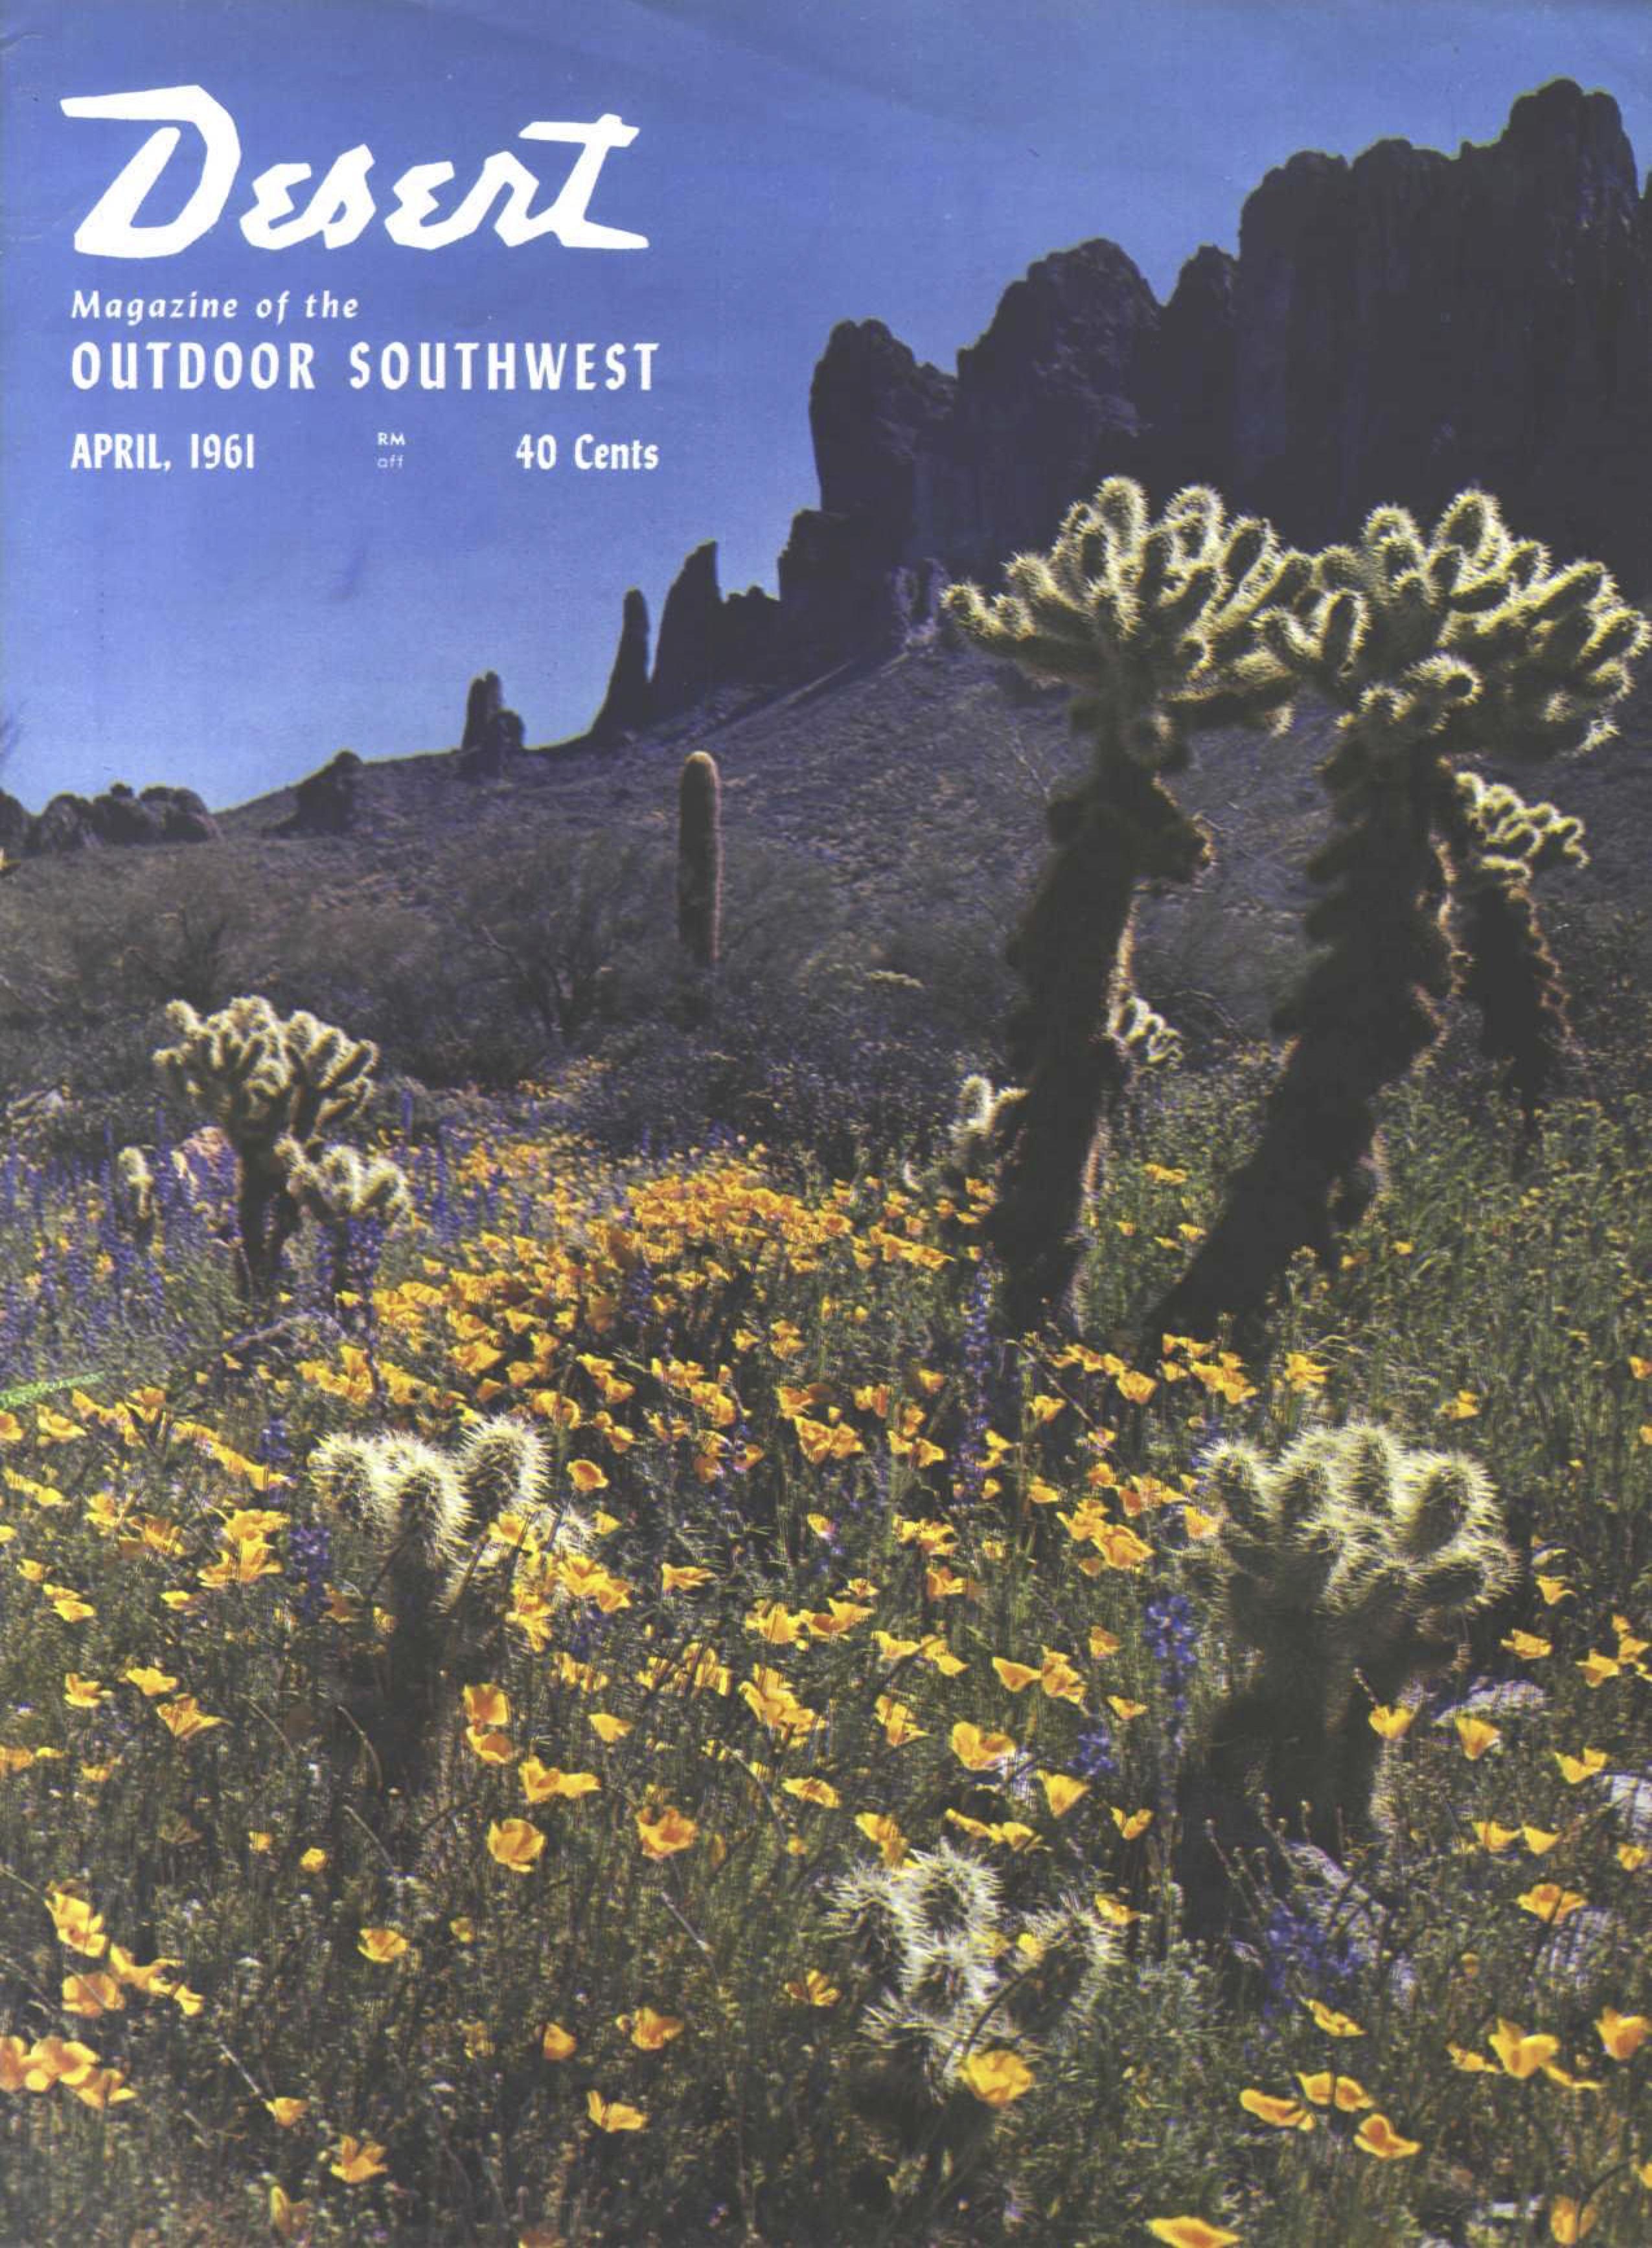 Desert-Magazine-1961-04